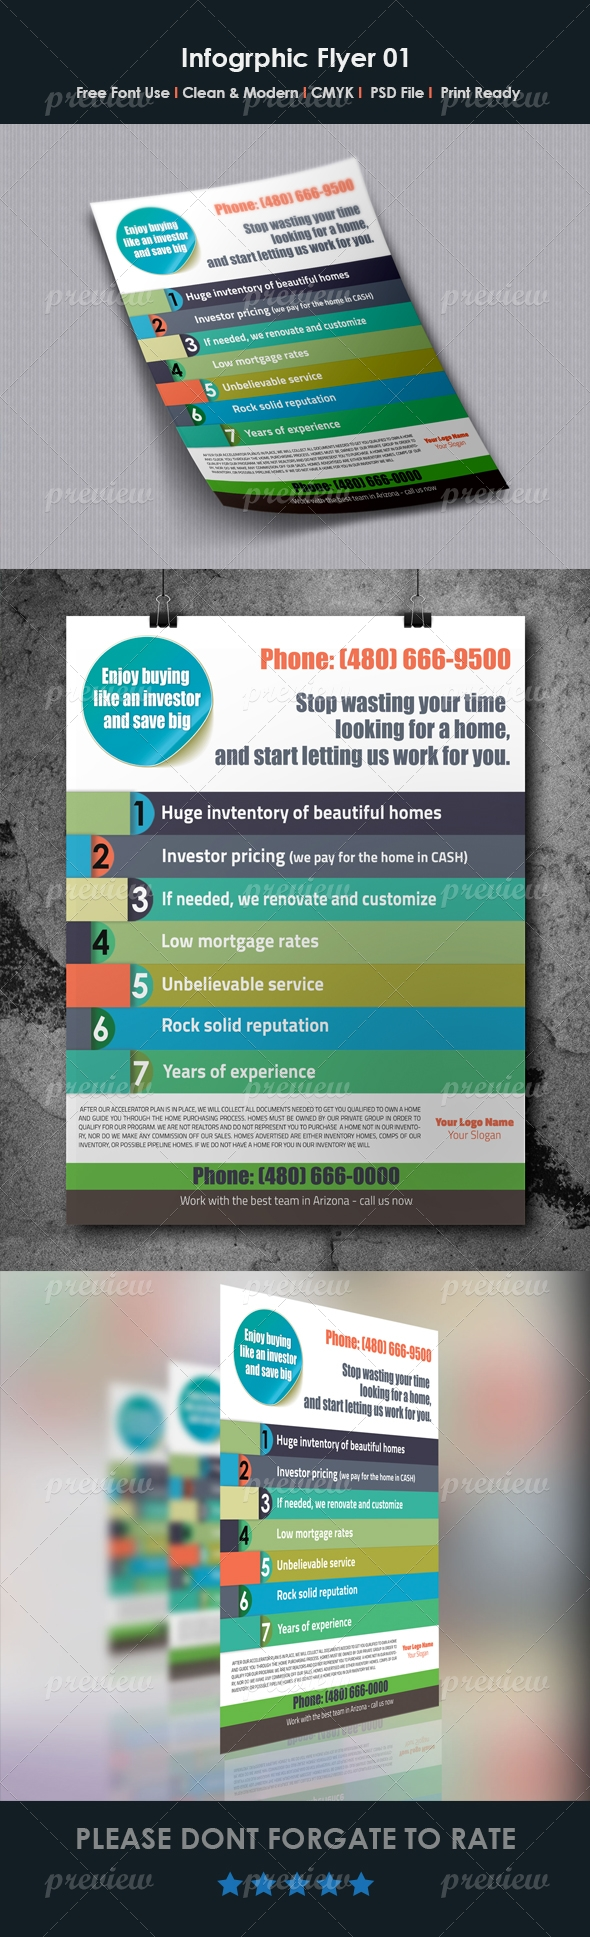 Infographic Flyer 01